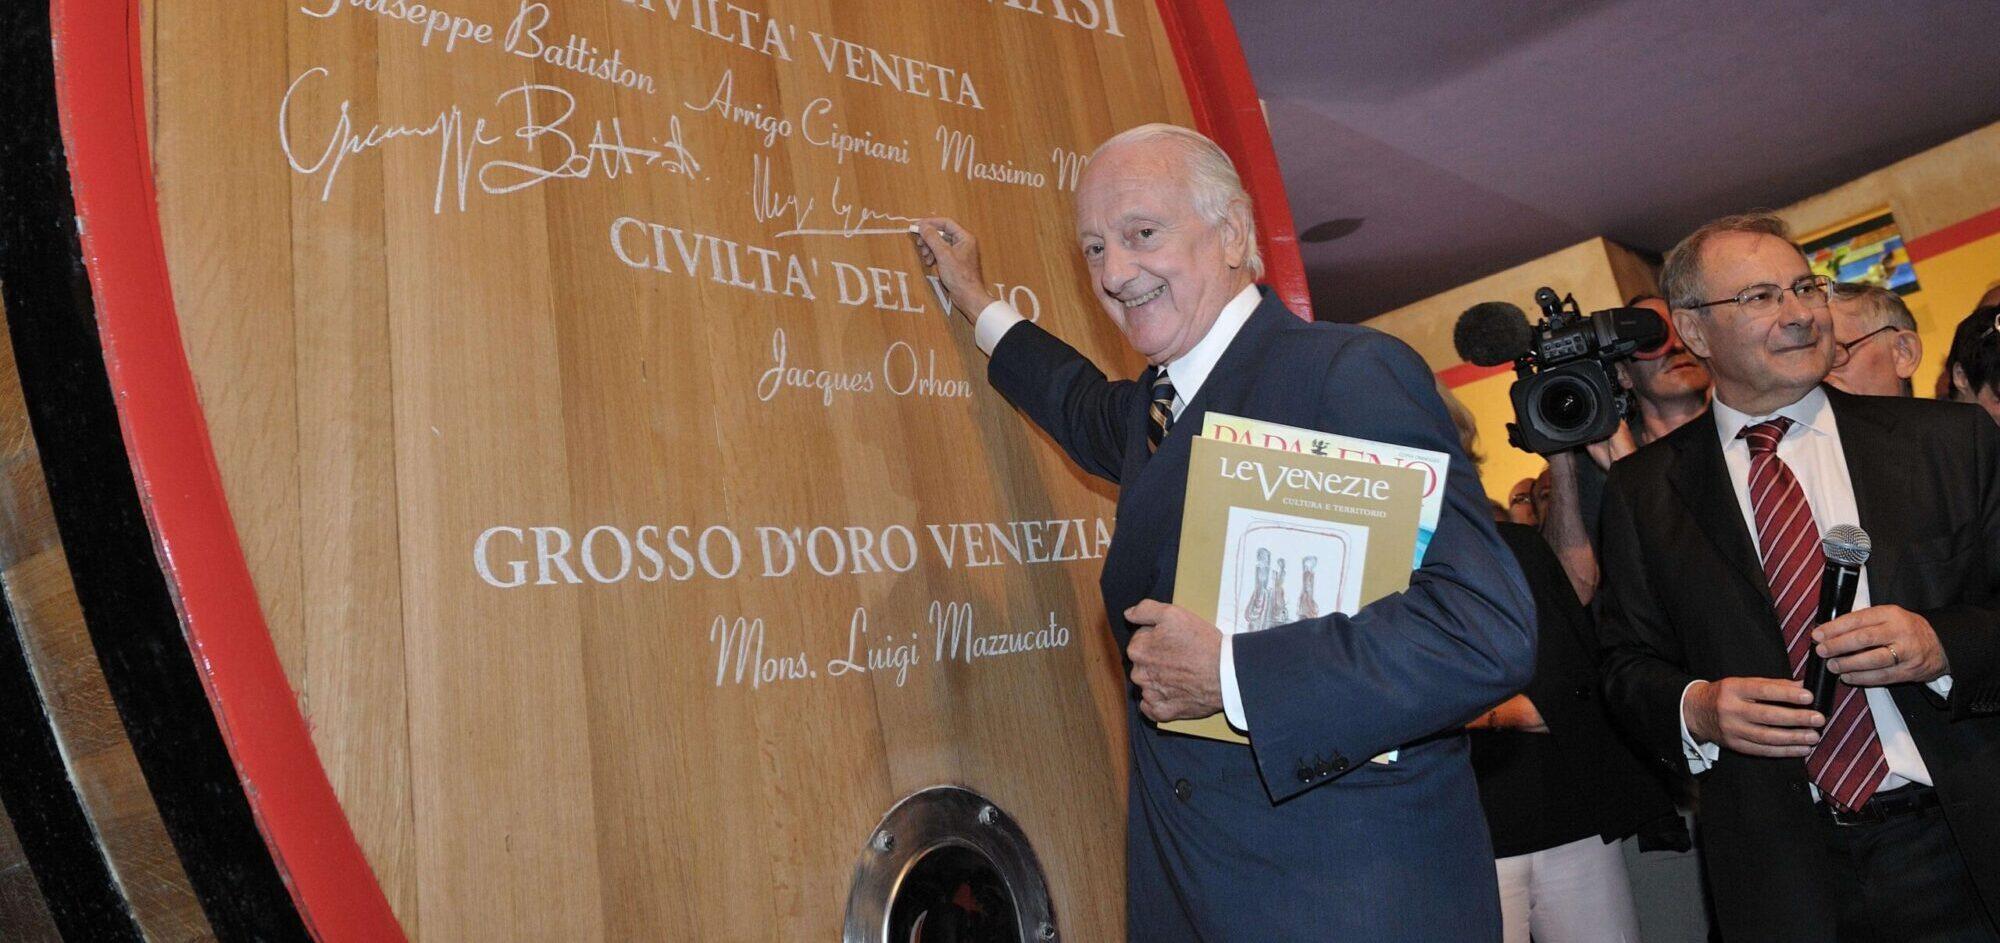 Arrigo Cipriani - Premio Masi Civiltà veneta 2011